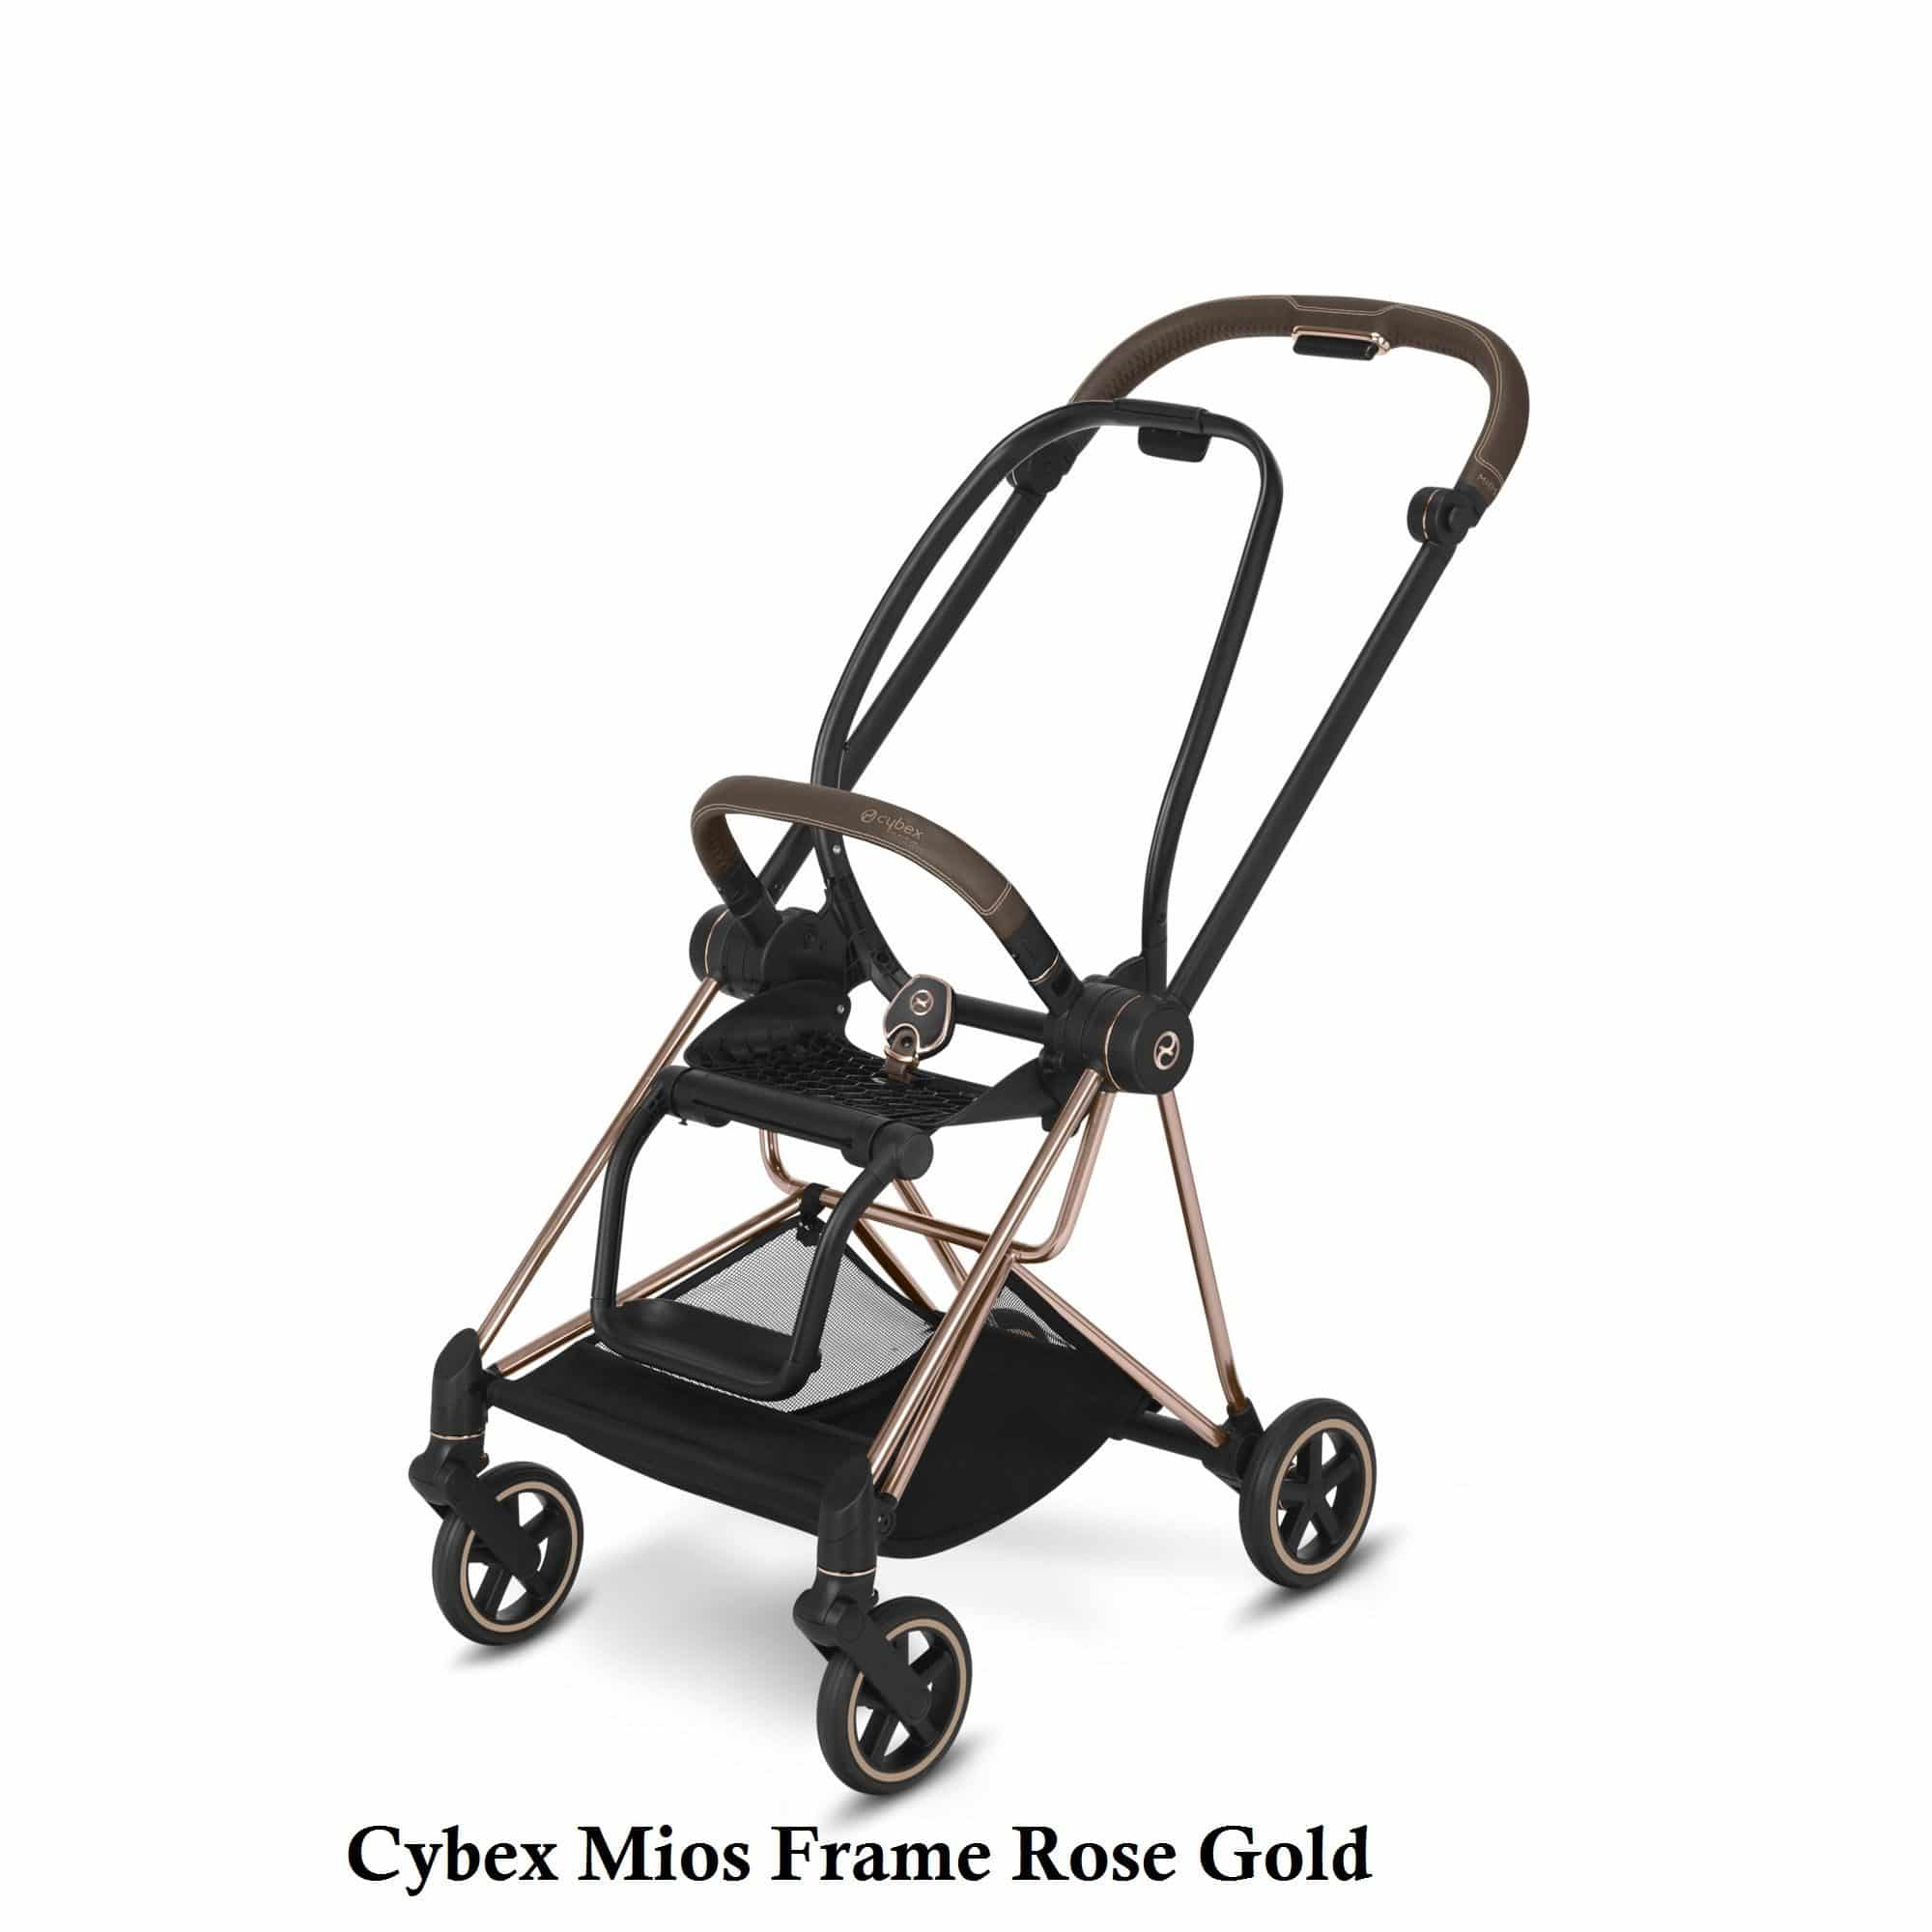 Cybex Mios Frame Rose Gold